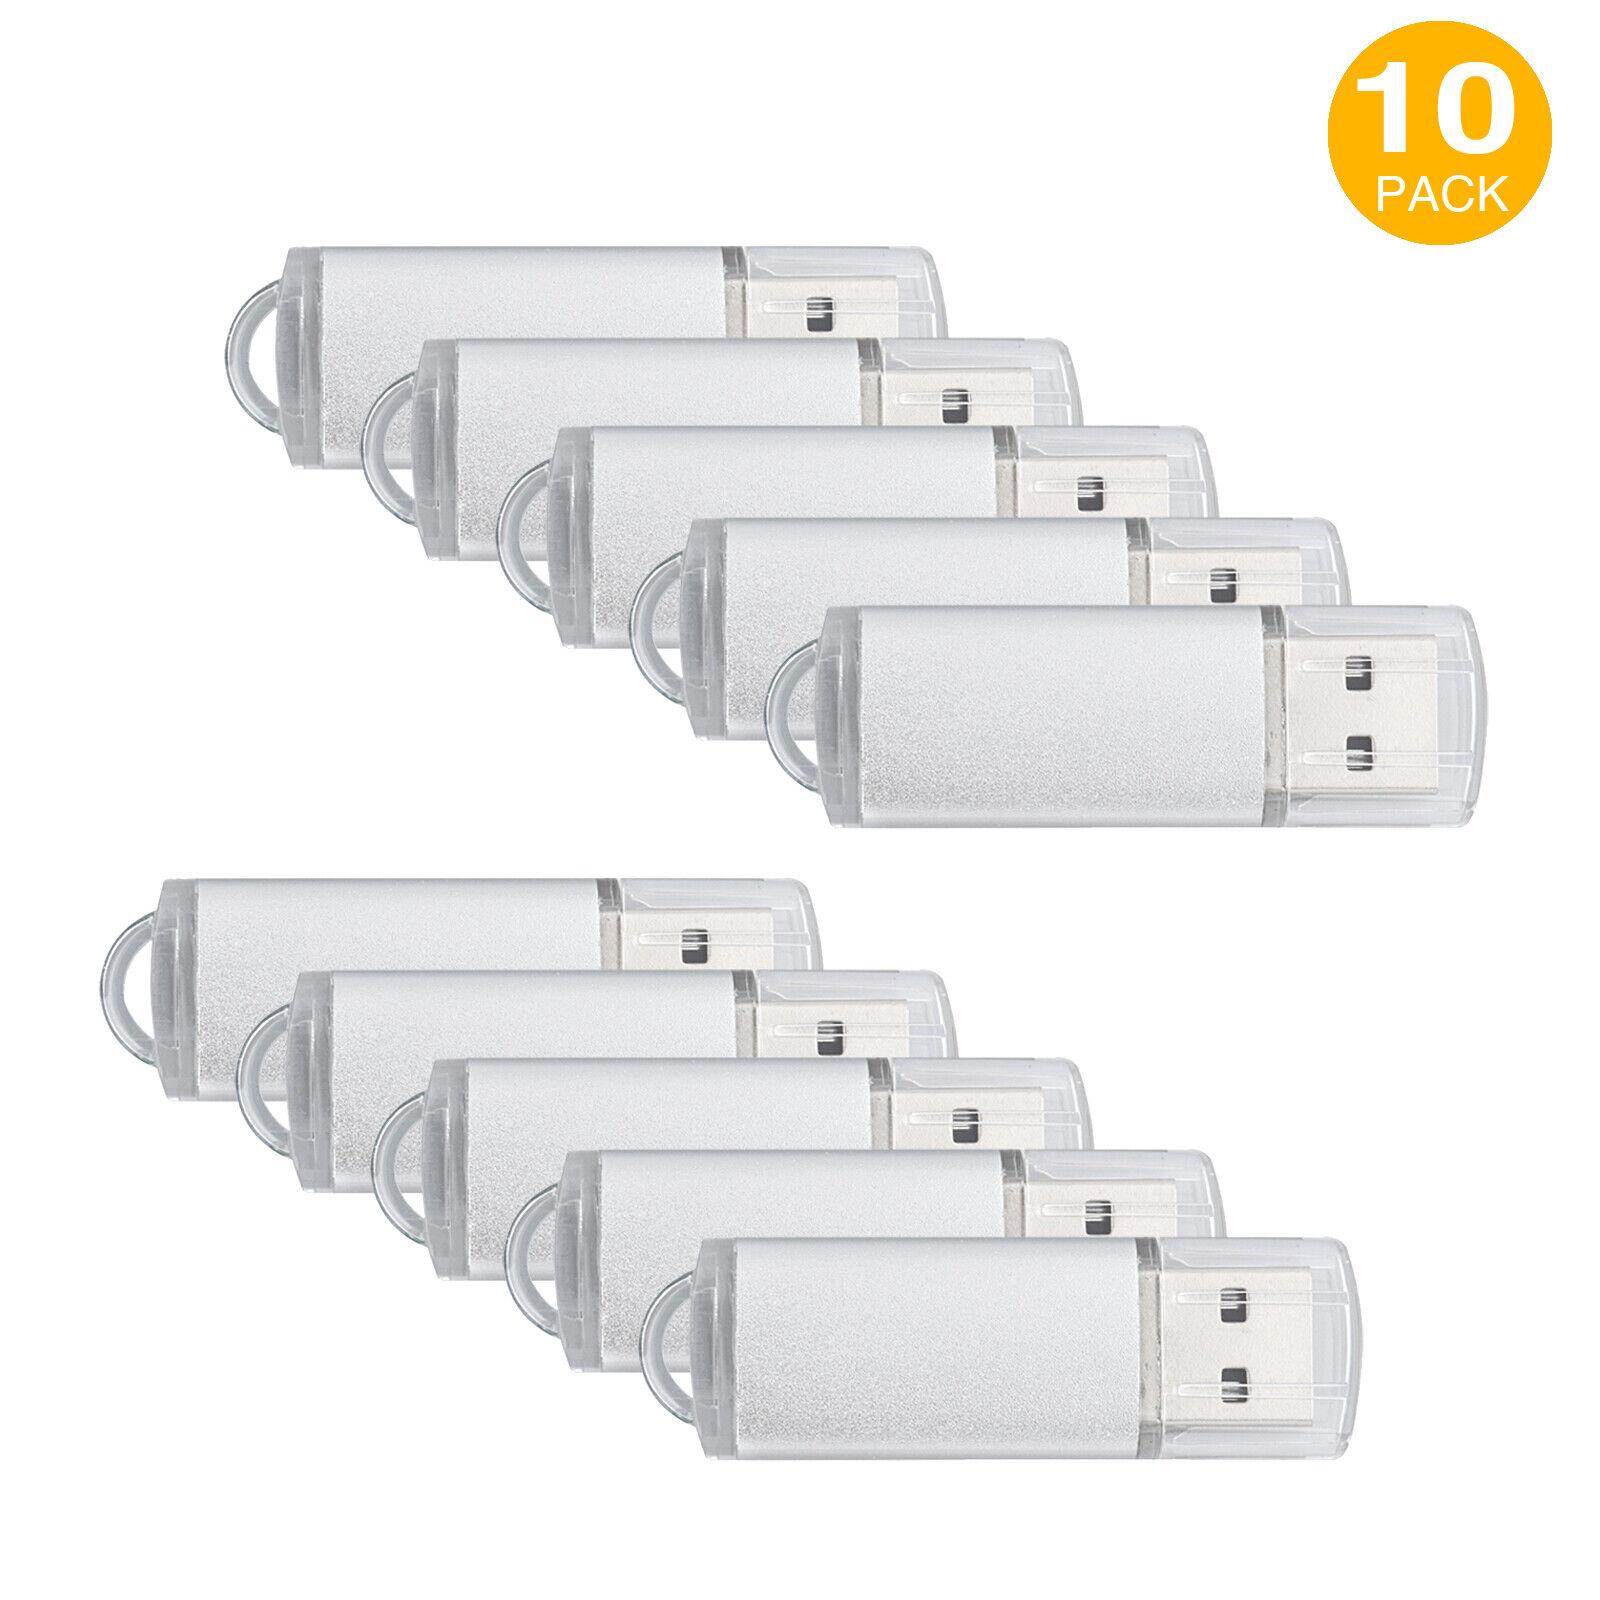 10Pack 1G 2G 4G 8G 16G USB Flash Drive Memory Stick Rectangle Thumb Pen Storage 121